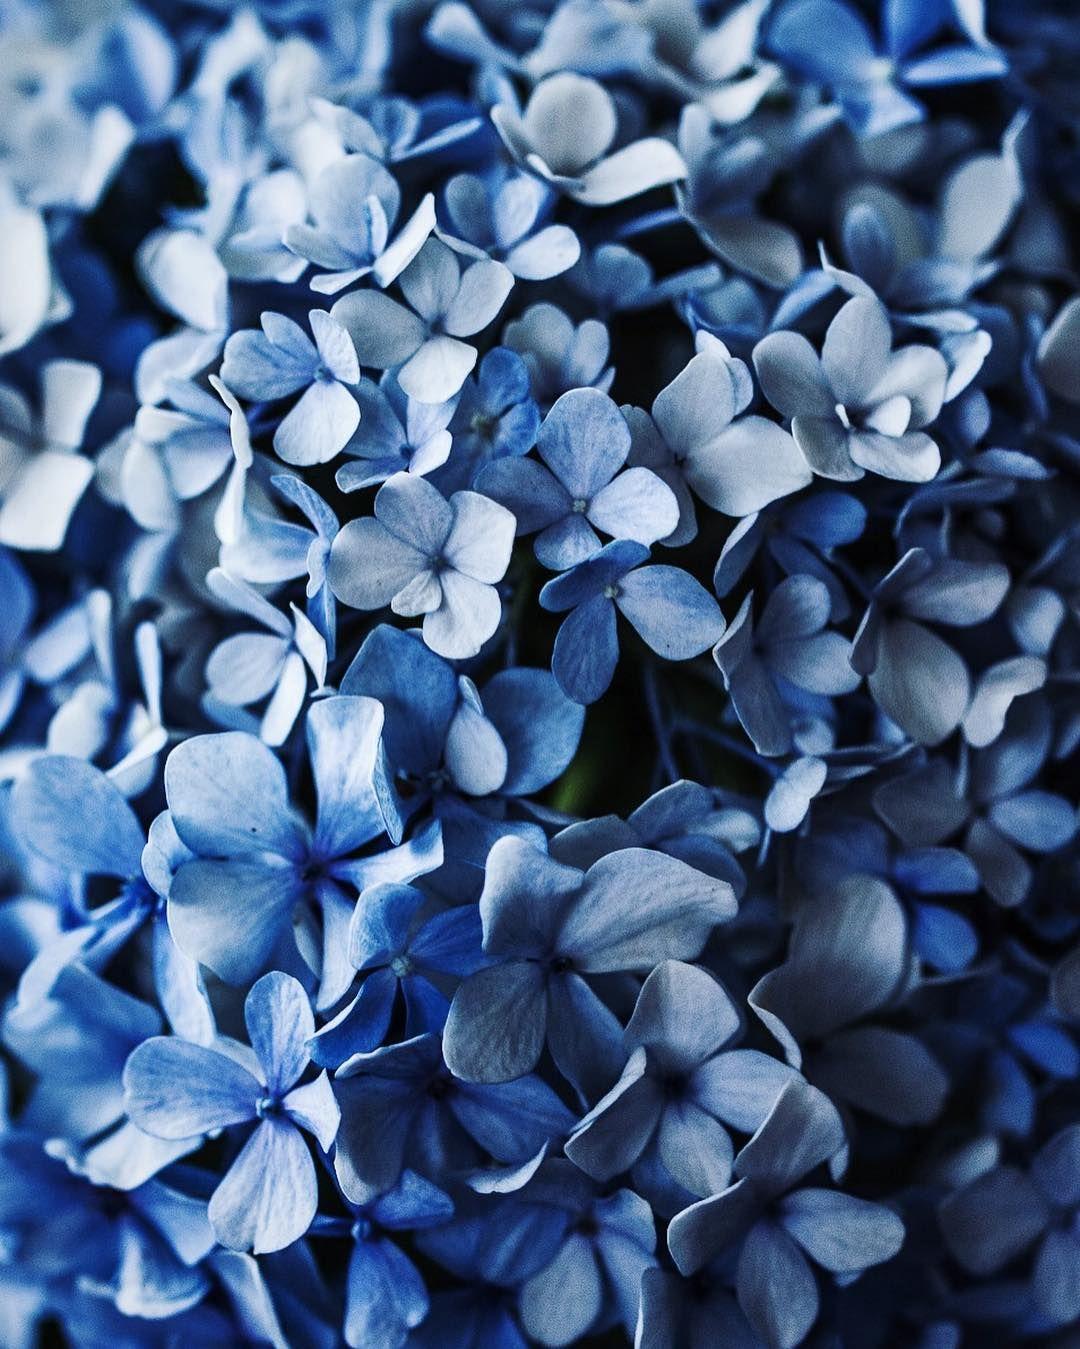 Голубая картинка на телефон